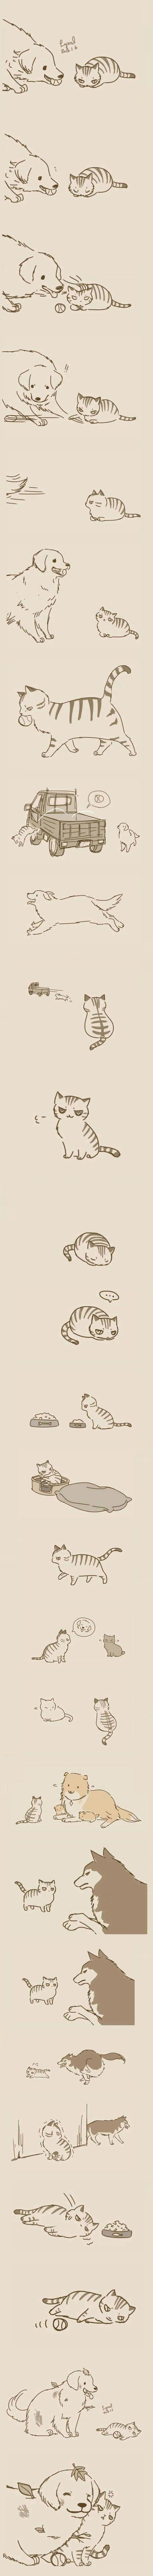 "It's cute *image not mine*--attribute ""Lynal"" 1/6/2016"